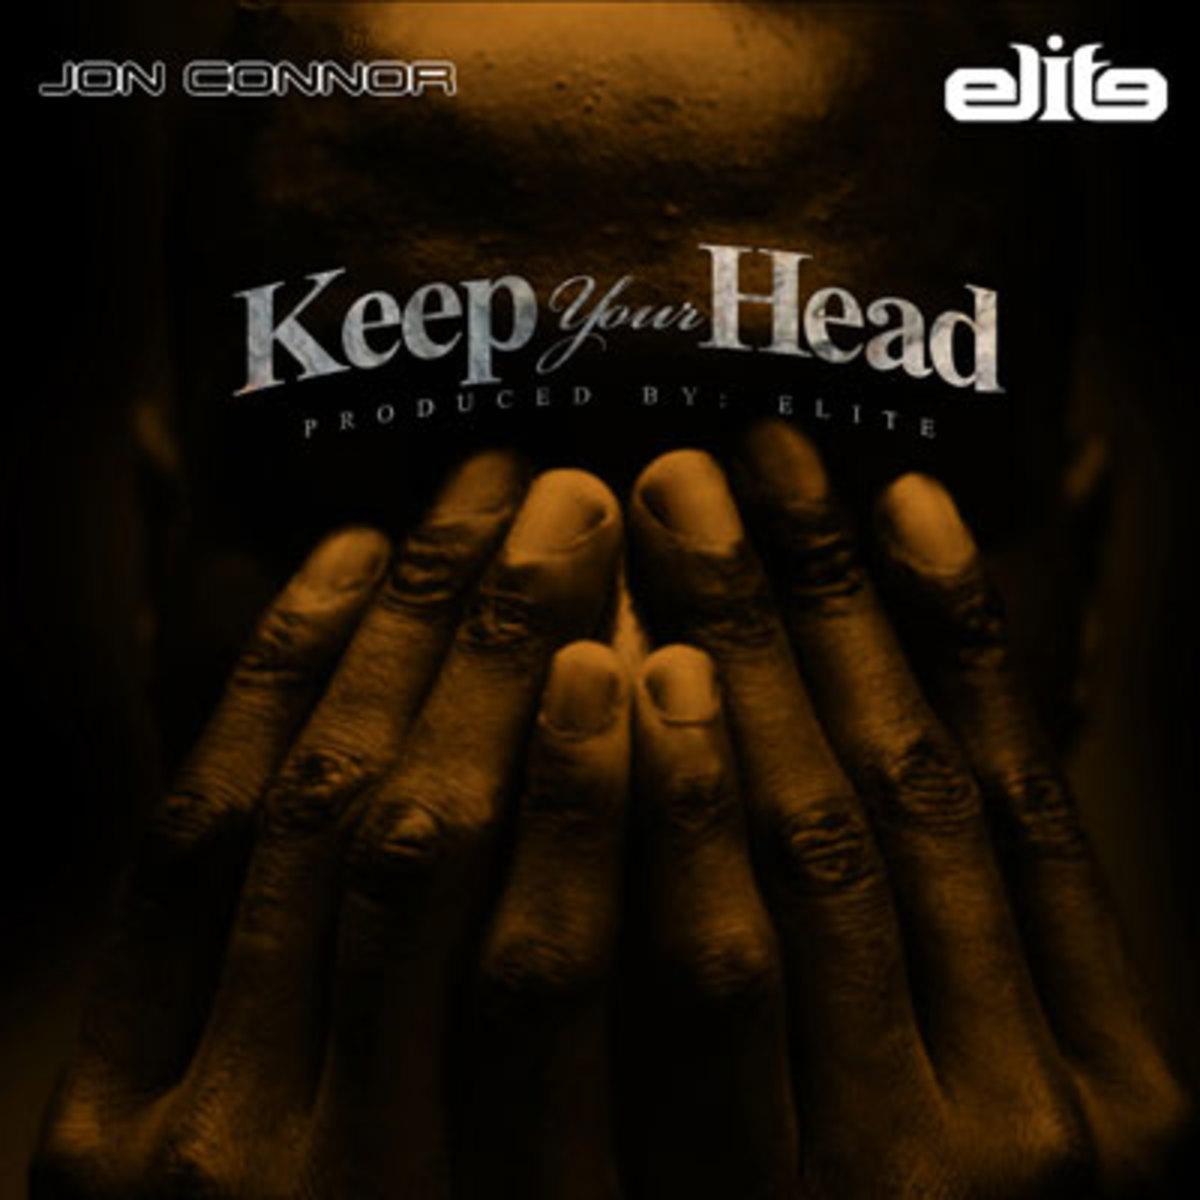 jonconnor-keepyourhead.jpg